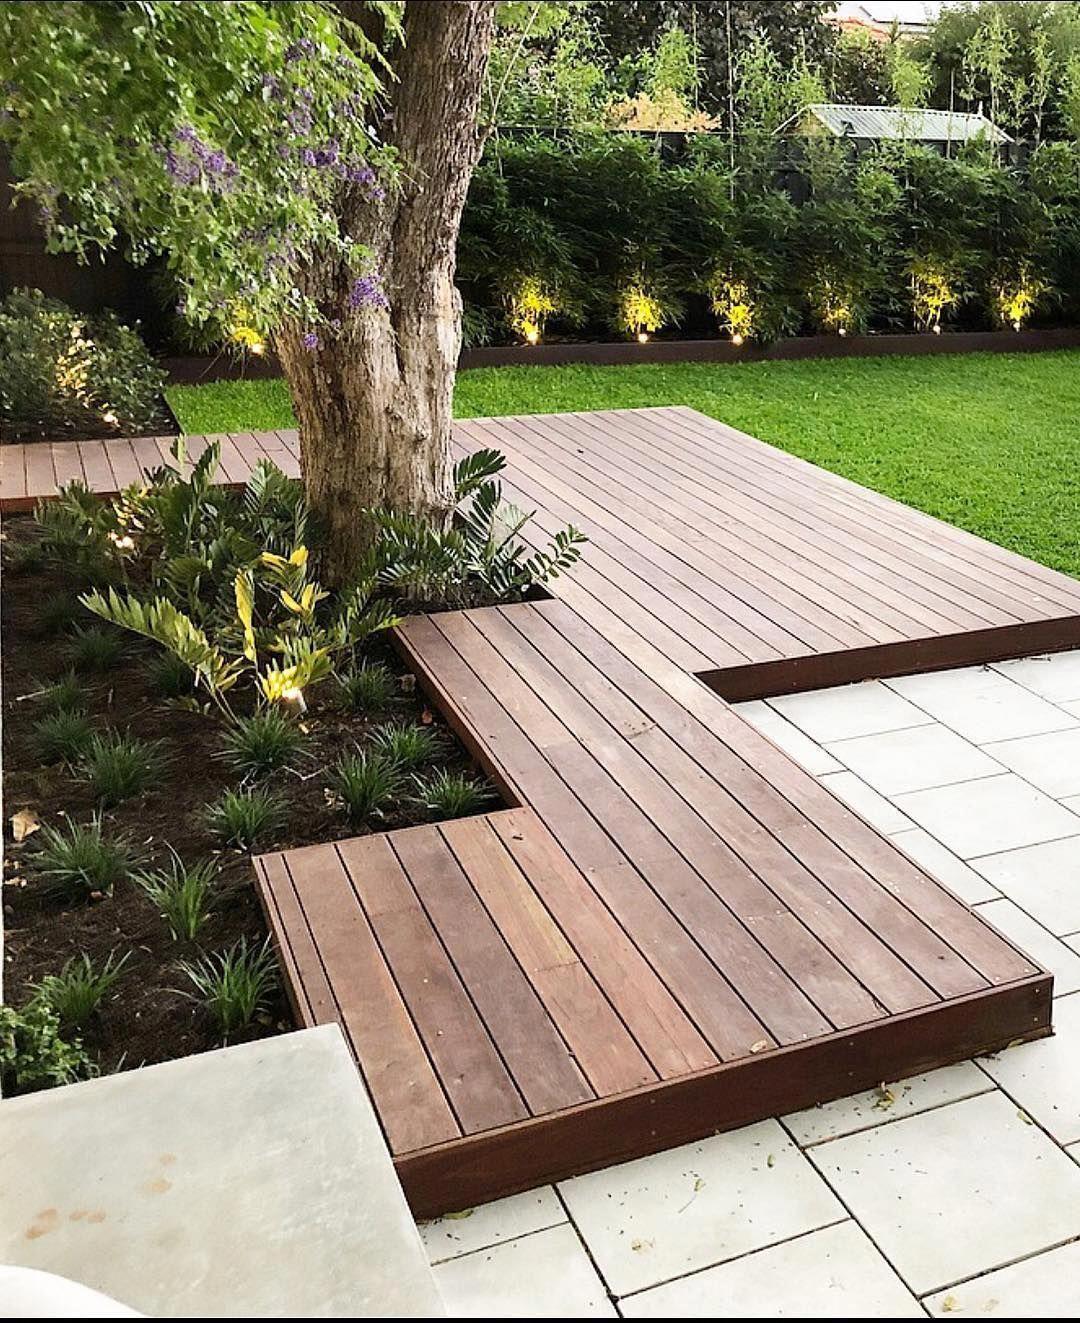 Small Garden Decking Ideas On A Budget: Awesome Backyard Design #AwesomeBackyardDesign In 2019